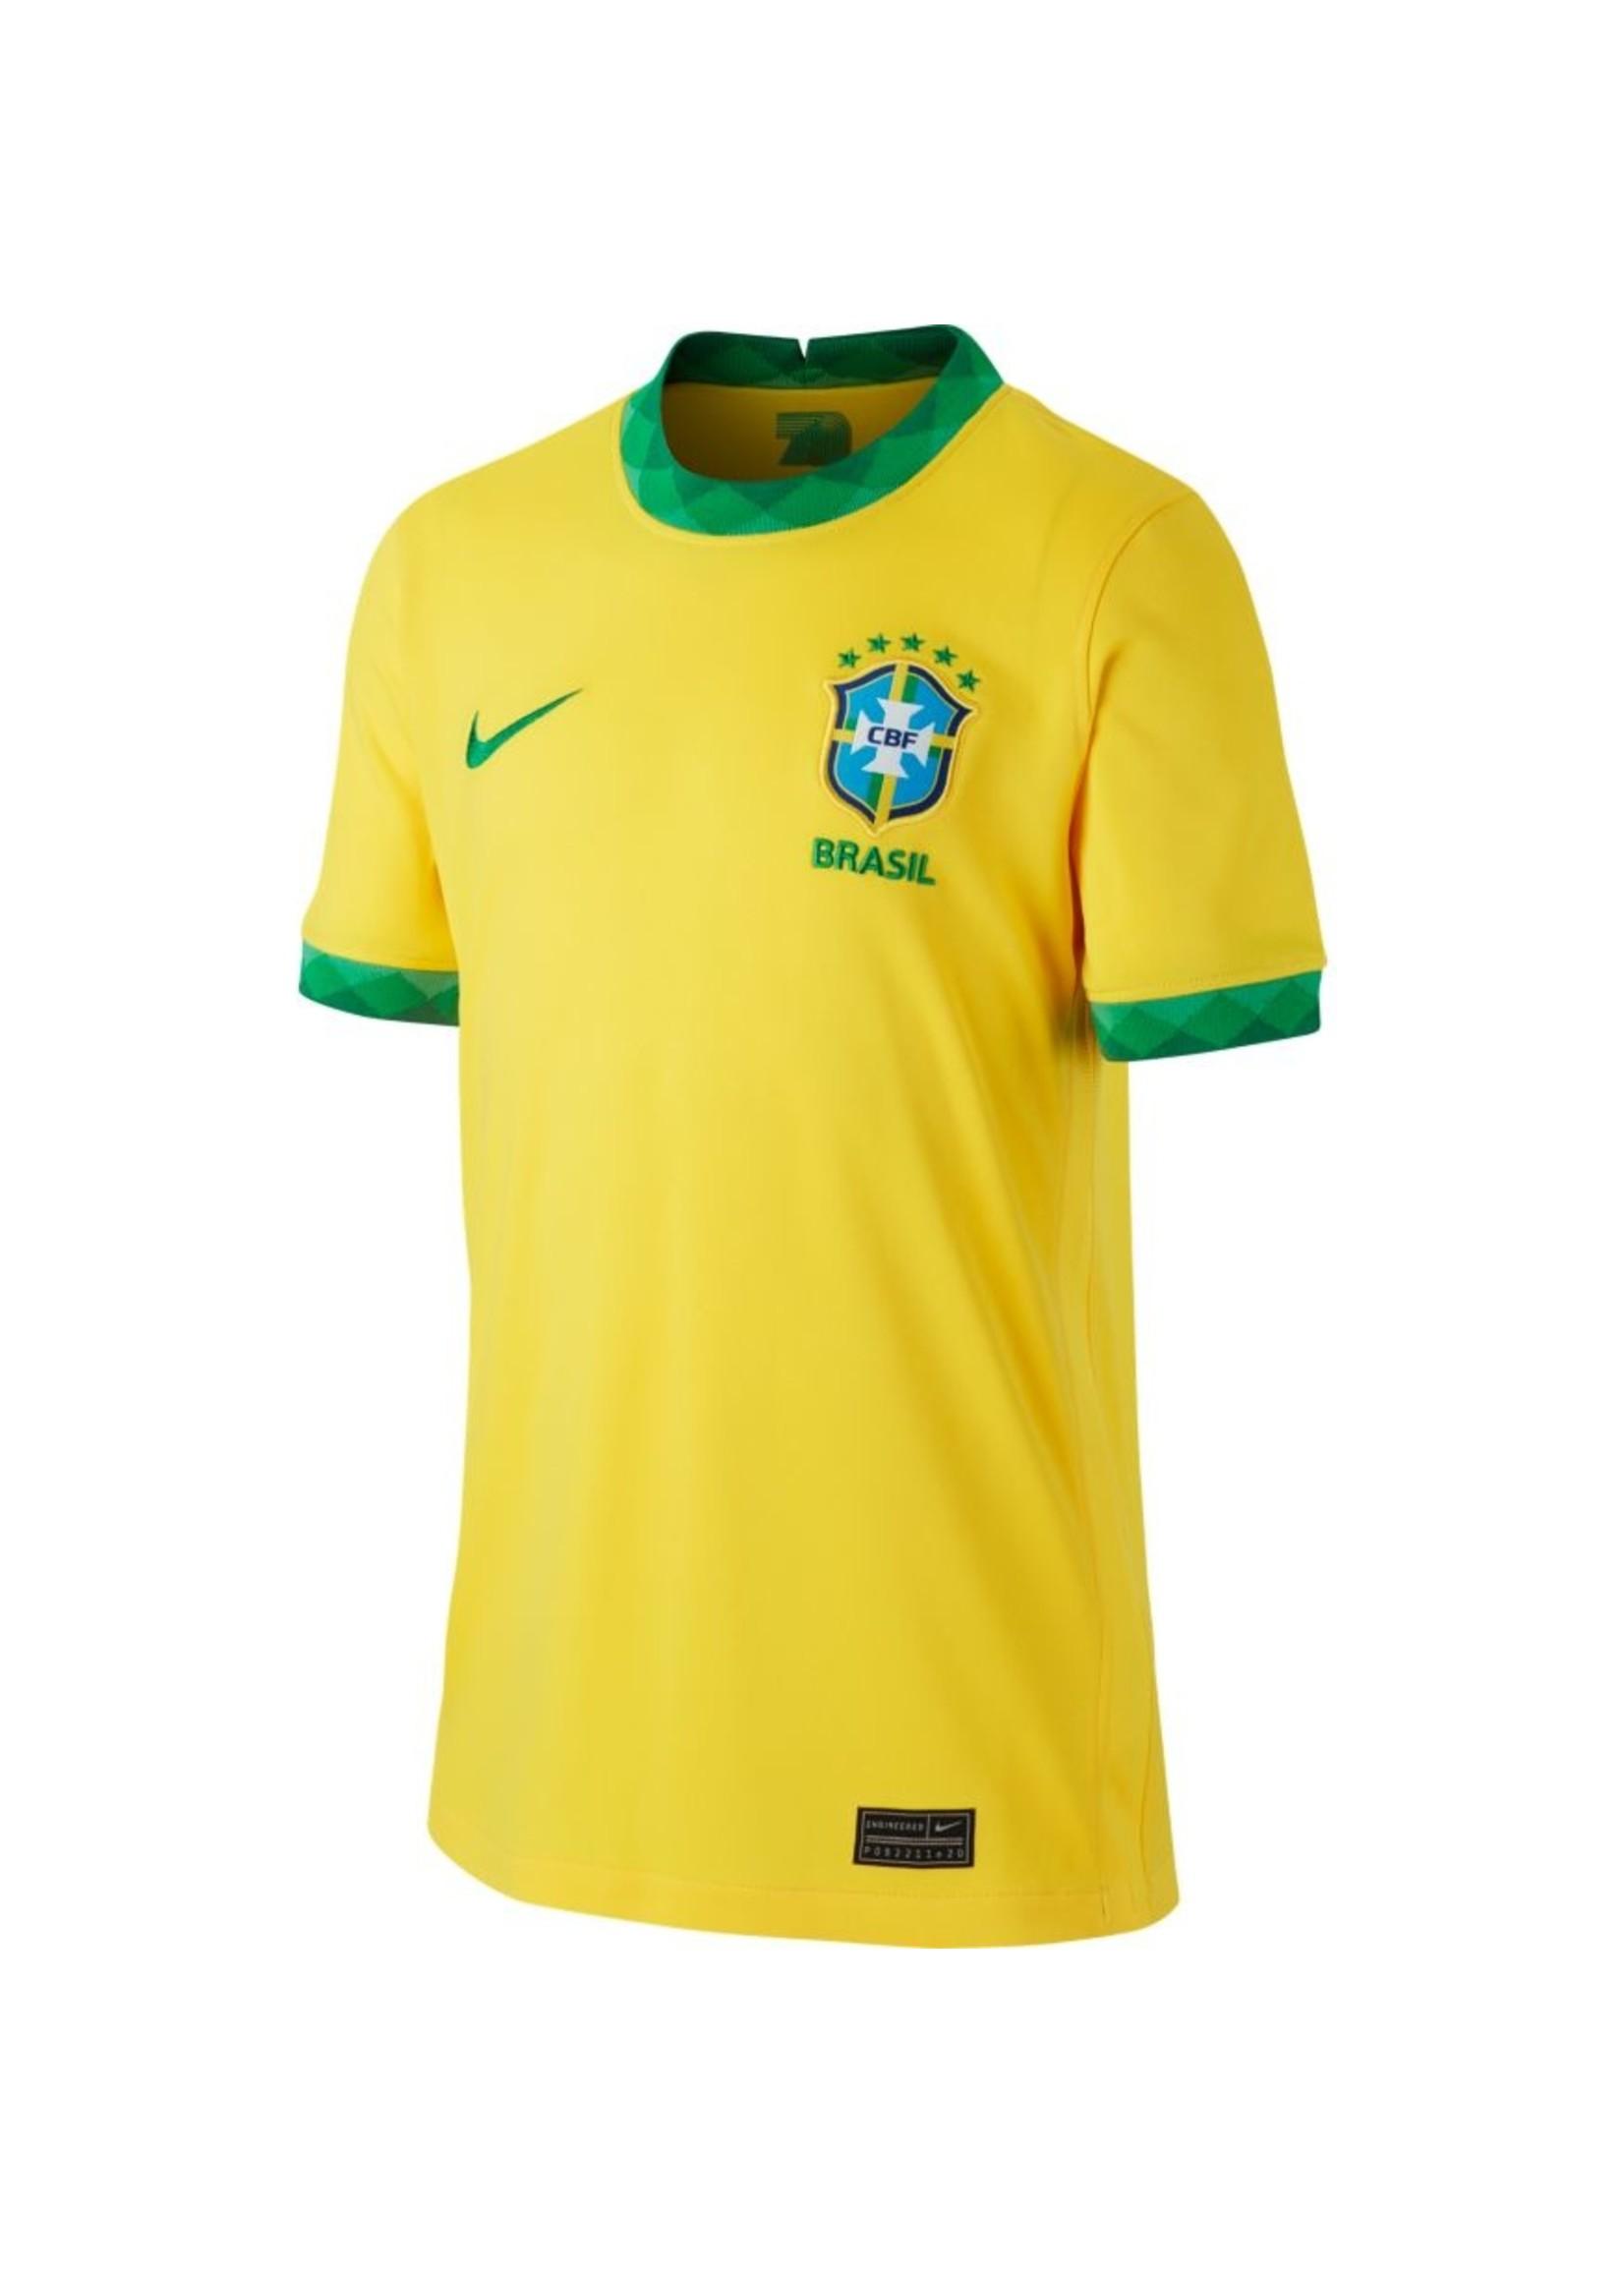 Nike Brazil 20/21 Home Jersey Youth